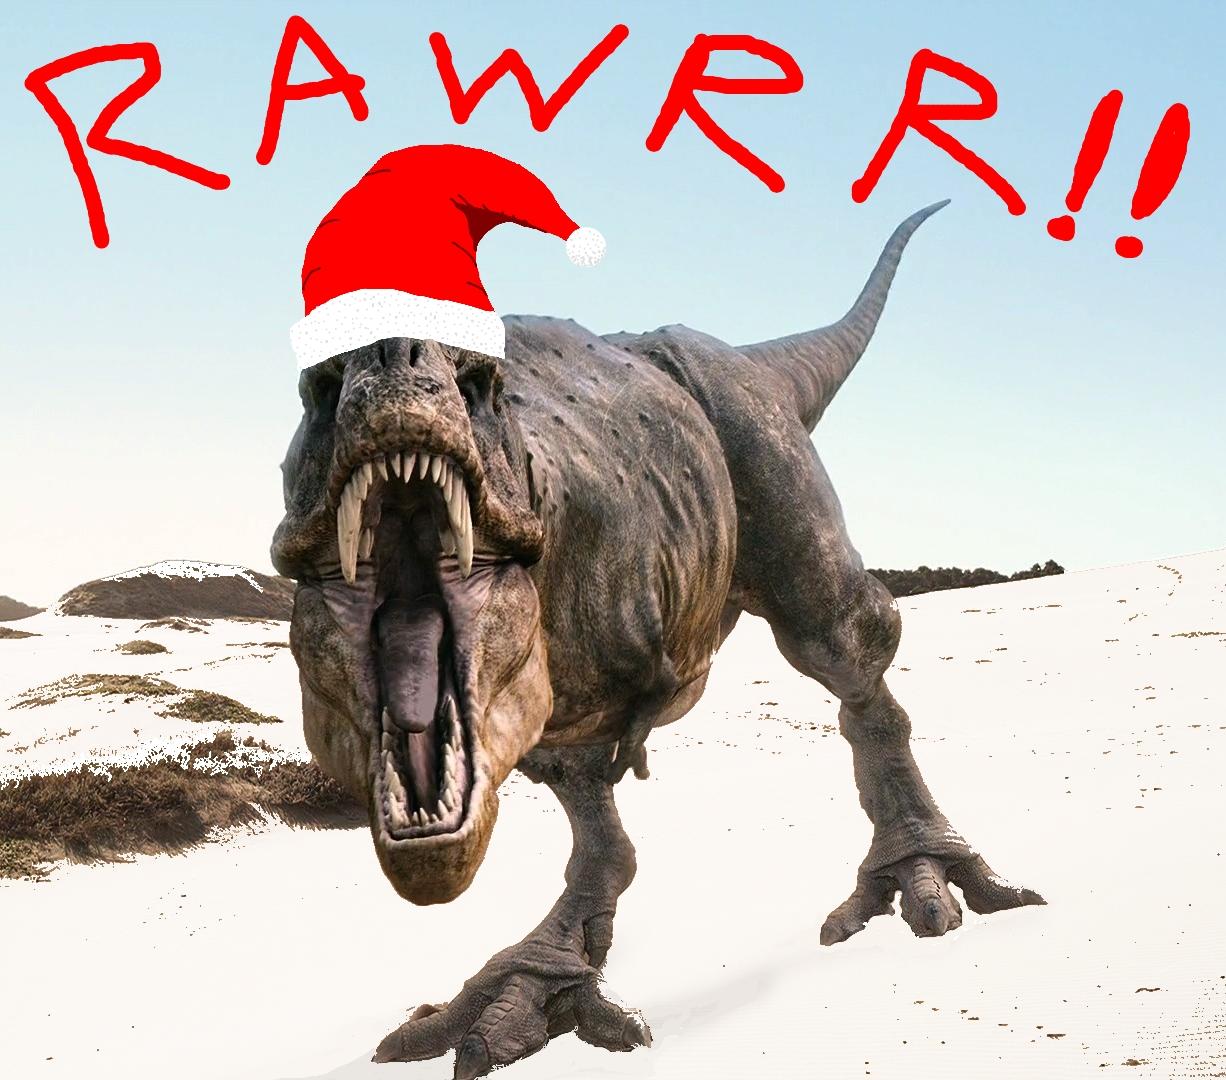 tyrannosaurus rex | zorgor